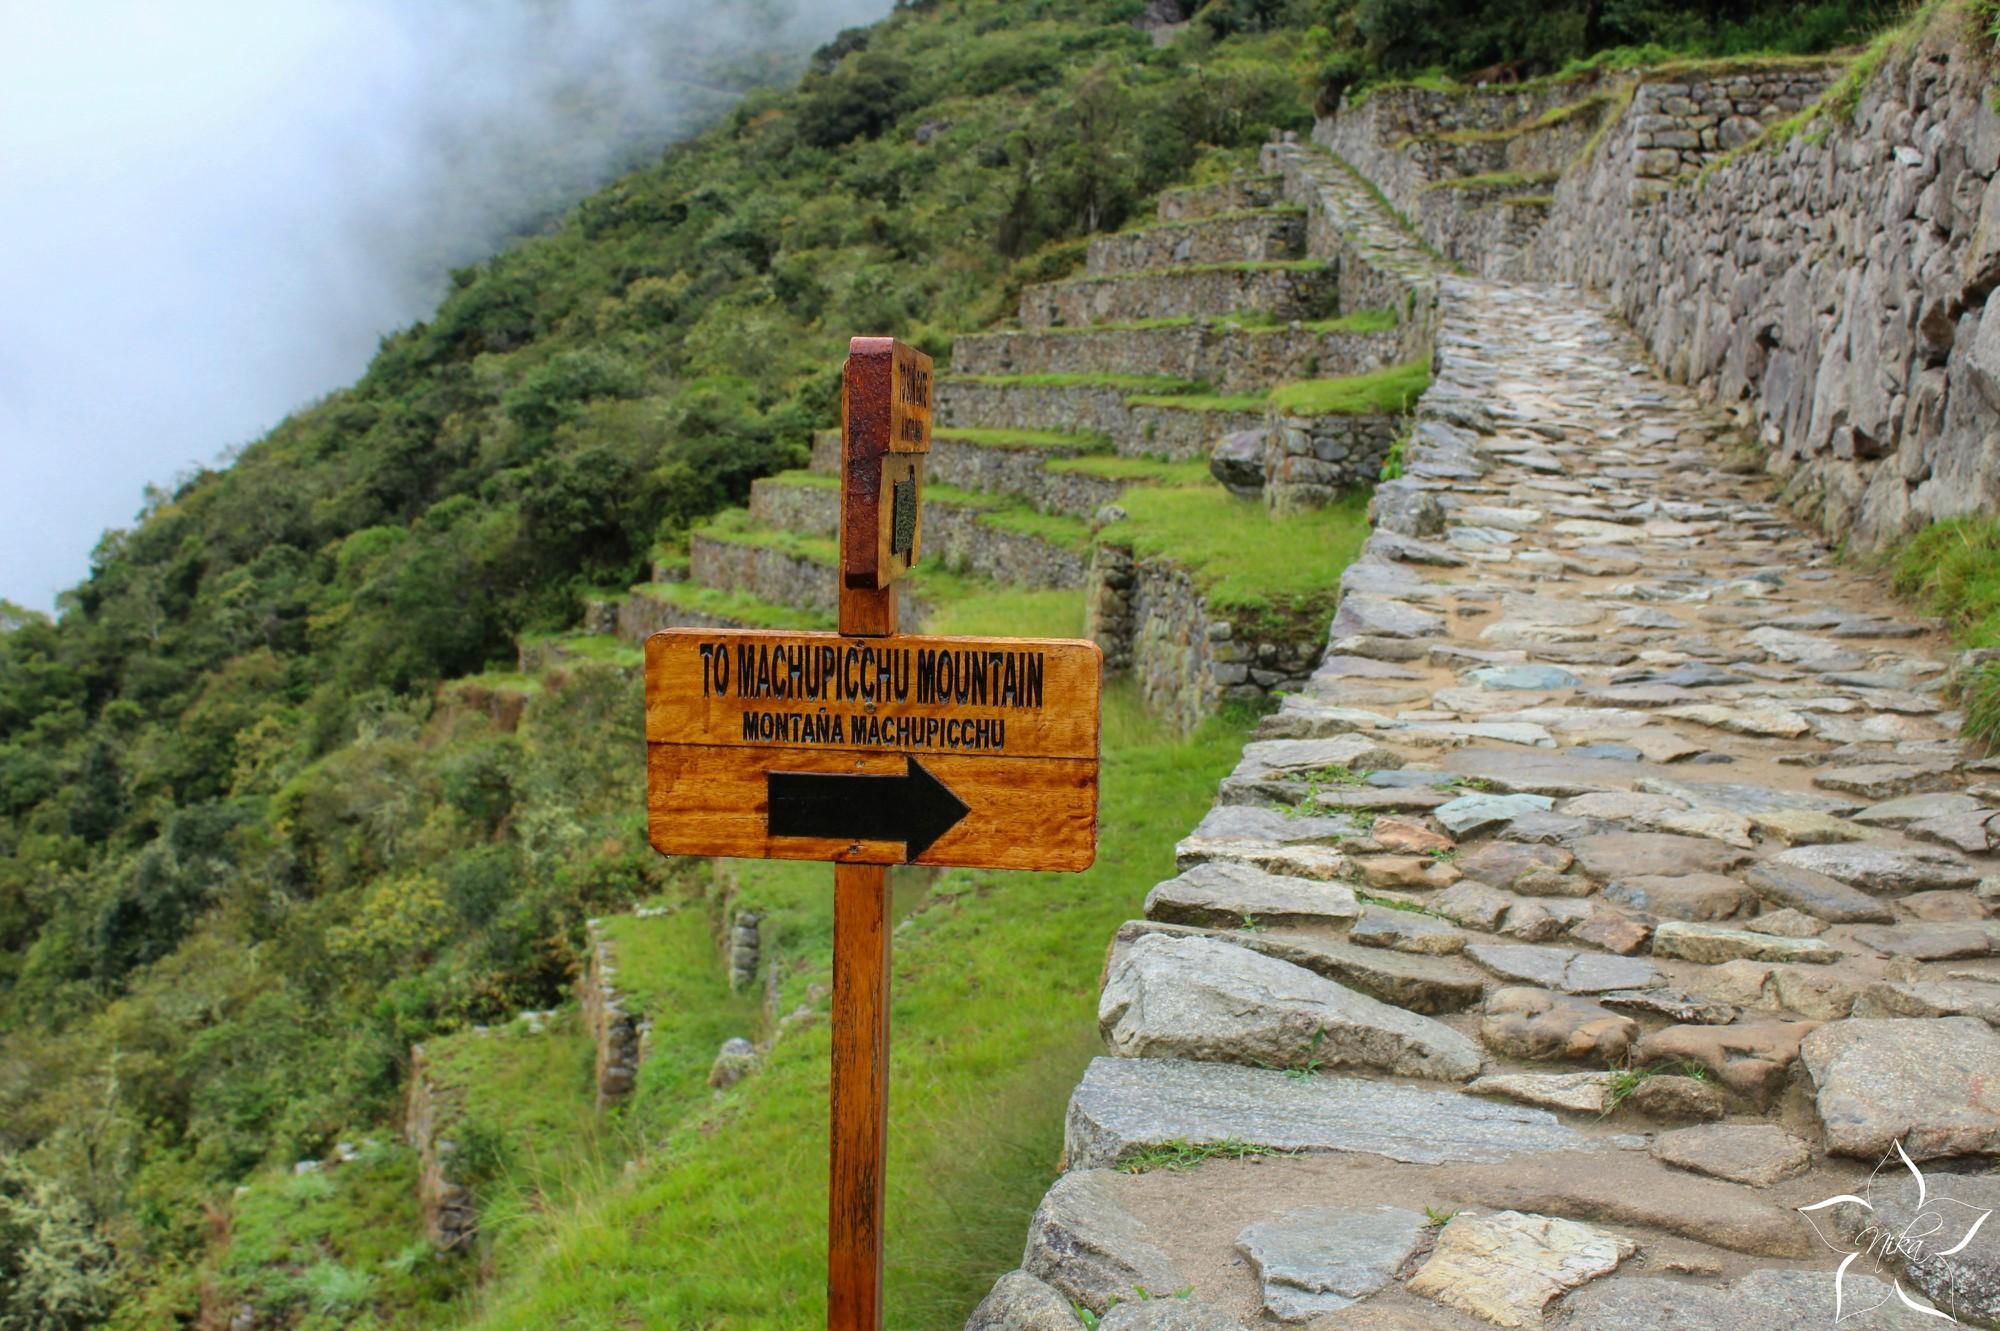 Machu Picchu montaňa